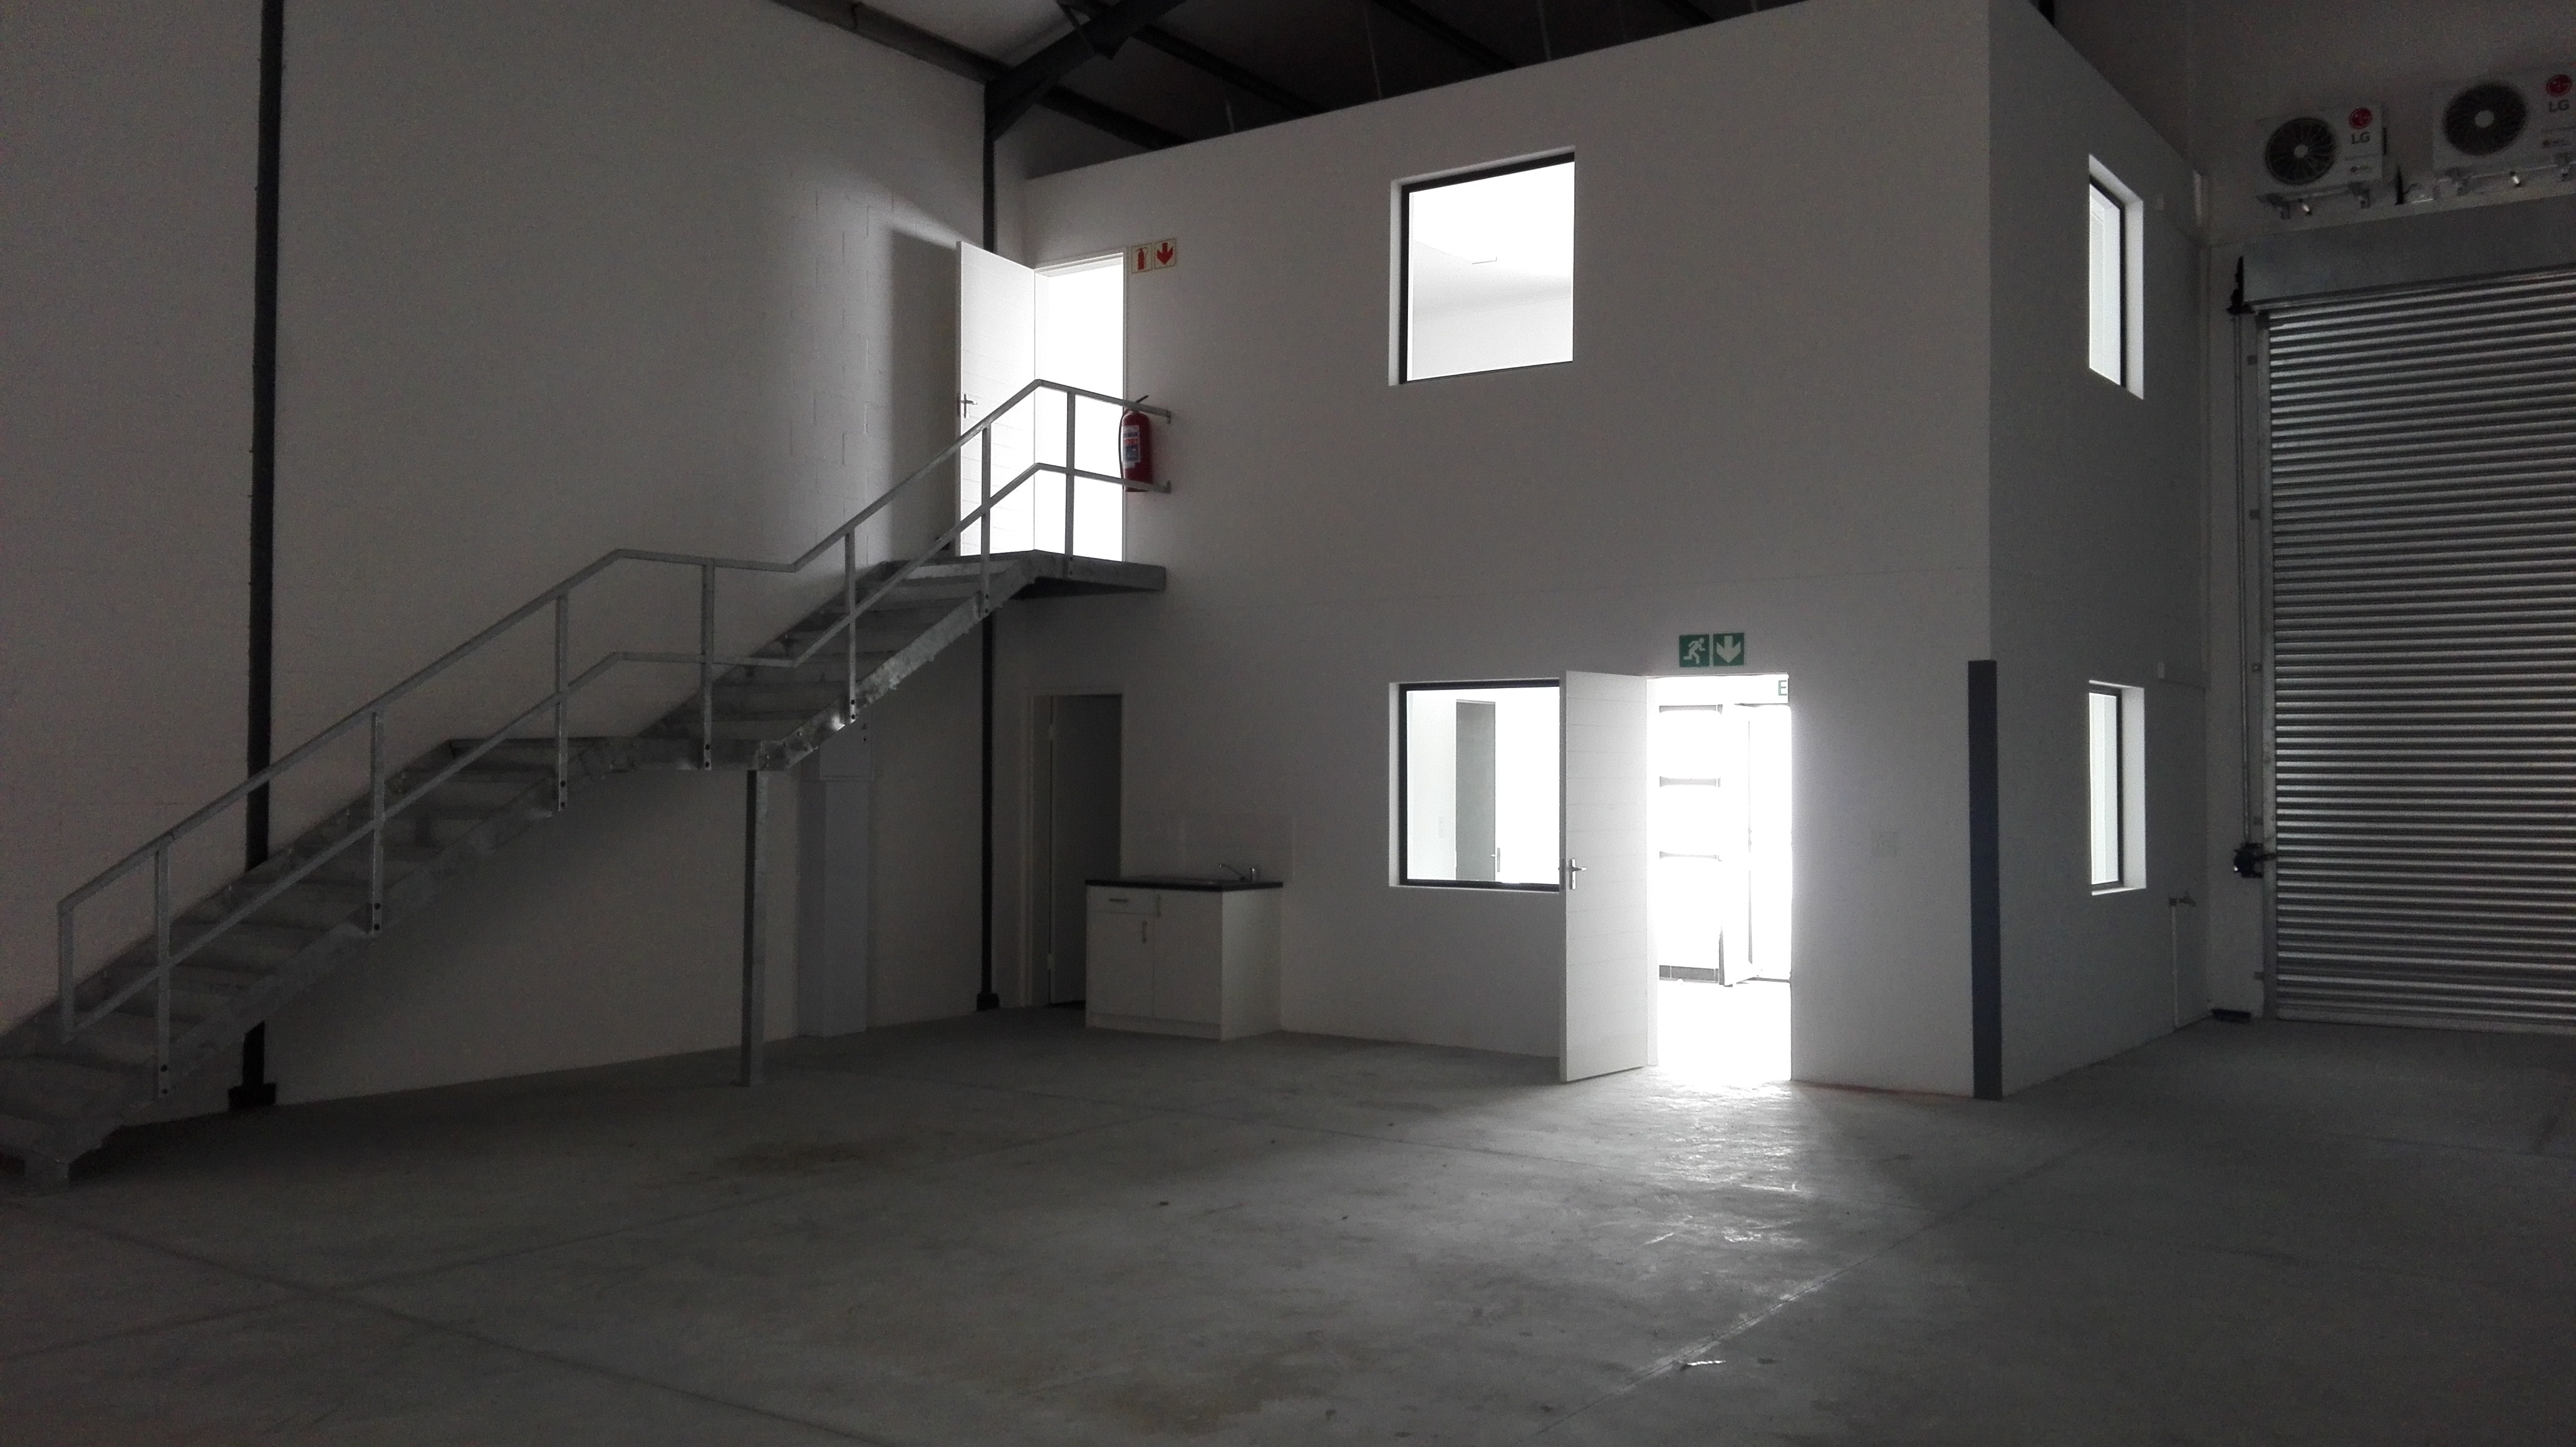 Warehouse, Brackenfell, Kwali Mark Construction CC